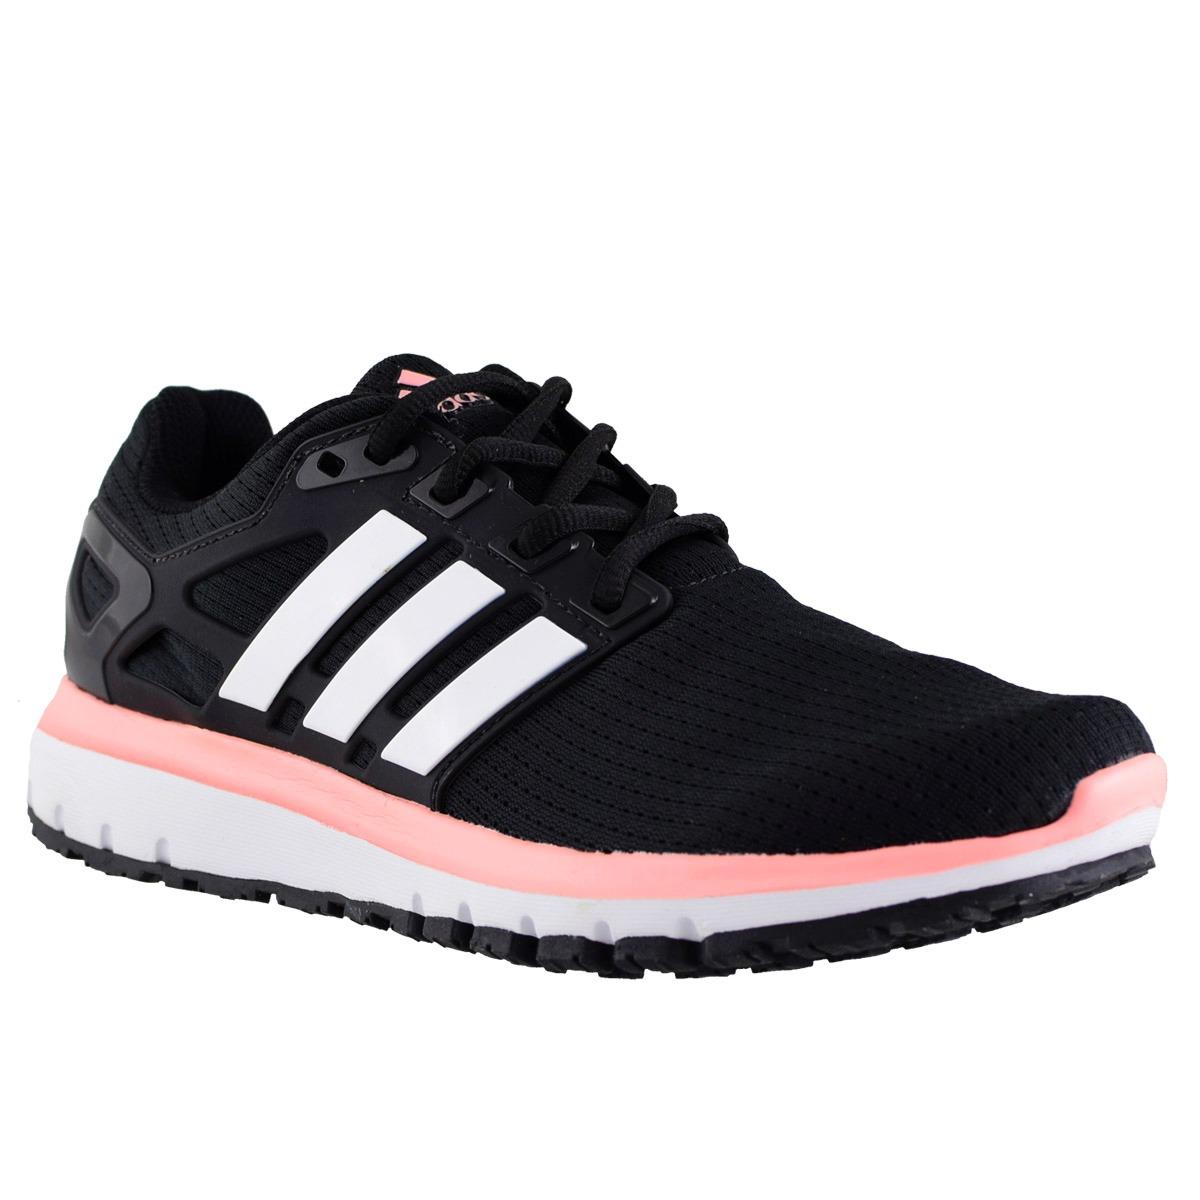 low priced a0f9e fbad2 zapatillas adidas energy cloud wtc mujer negro. Cargando zoom.